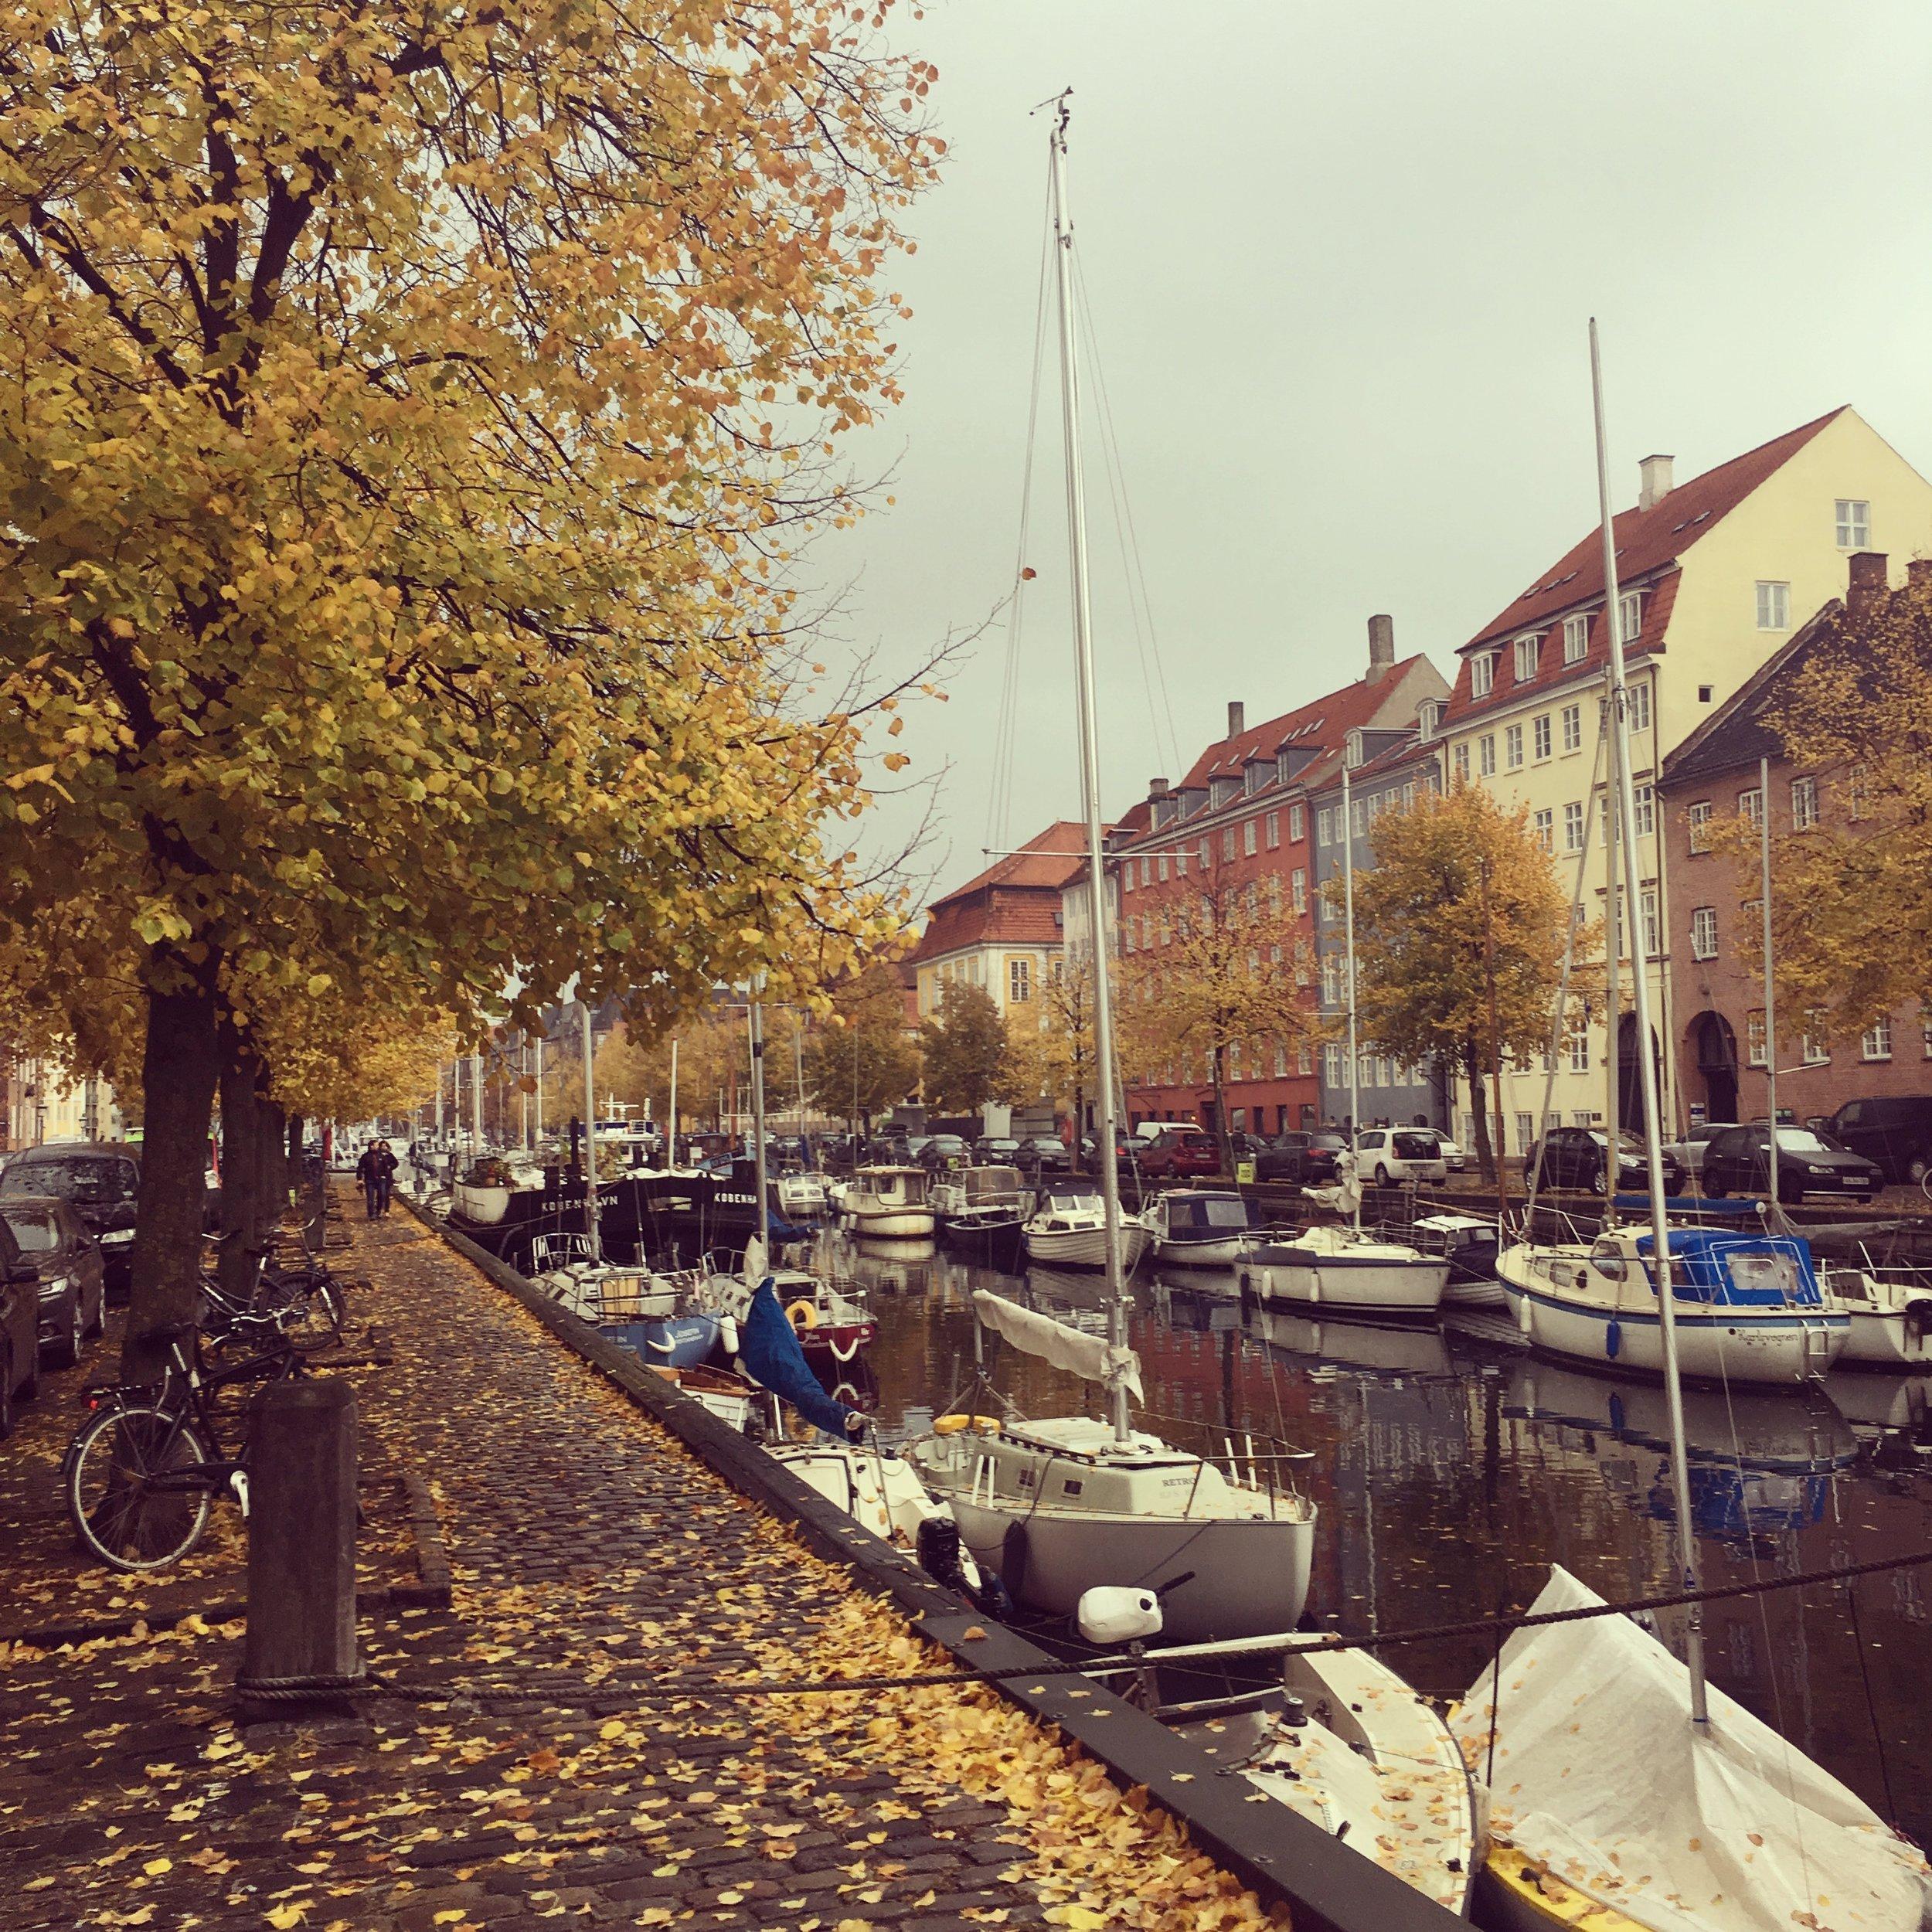 Photo: Rikke Hjuler